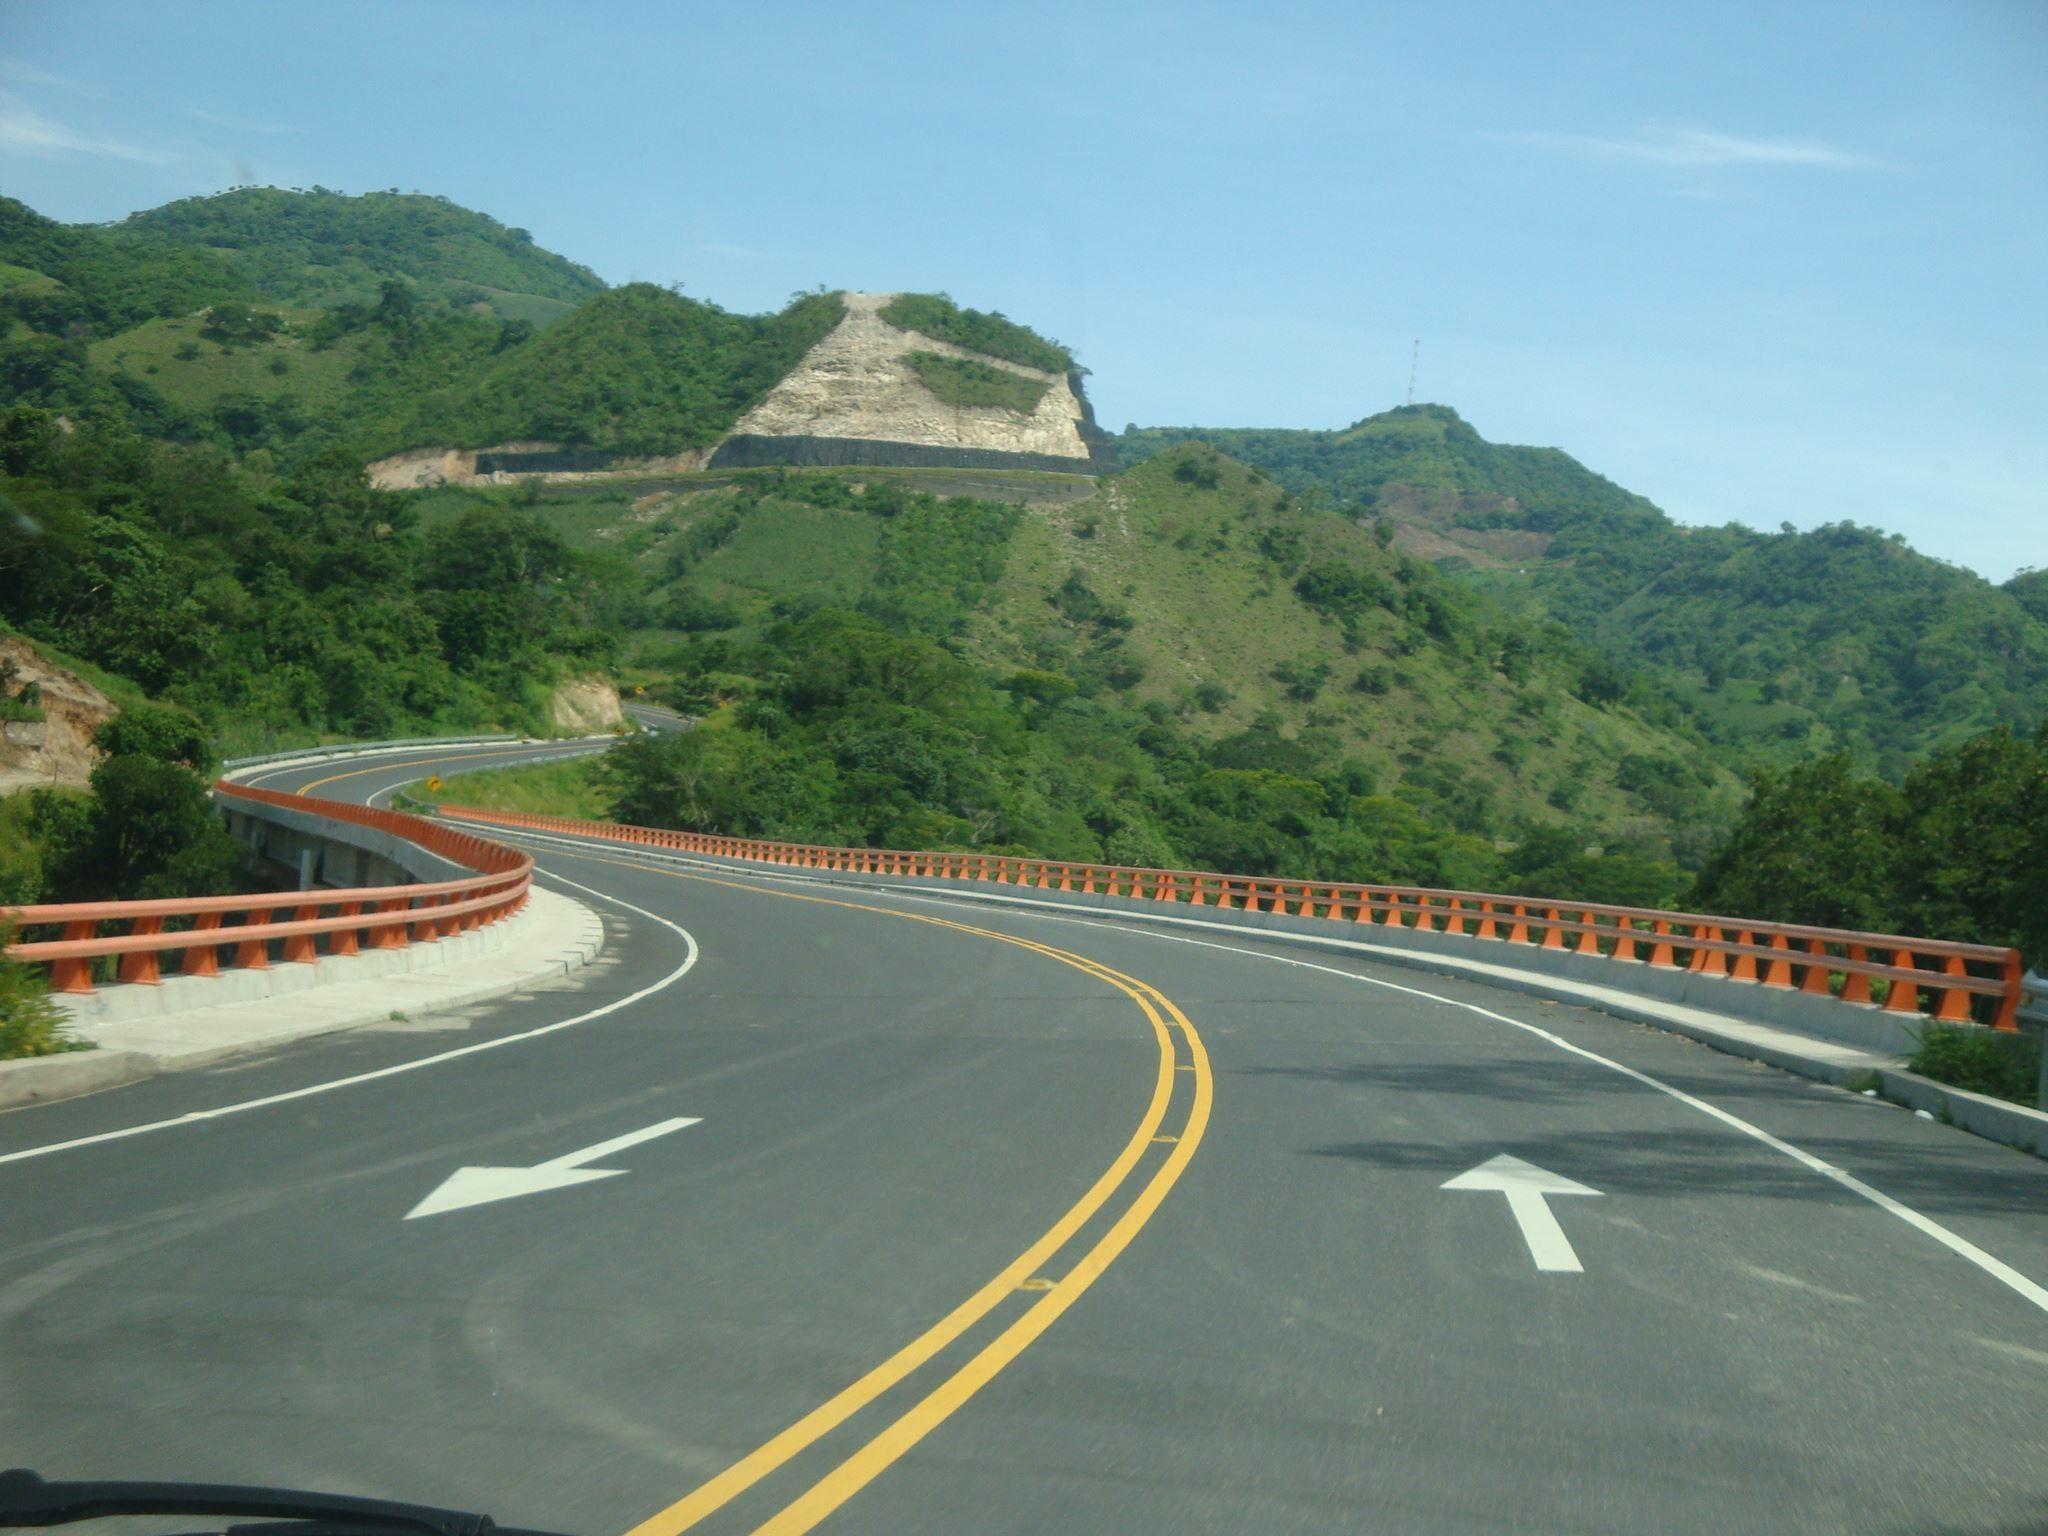 Carretera Longitudinal Del Nortetramo Metapan Santa Rosa Guachipilin Ana El Salvador